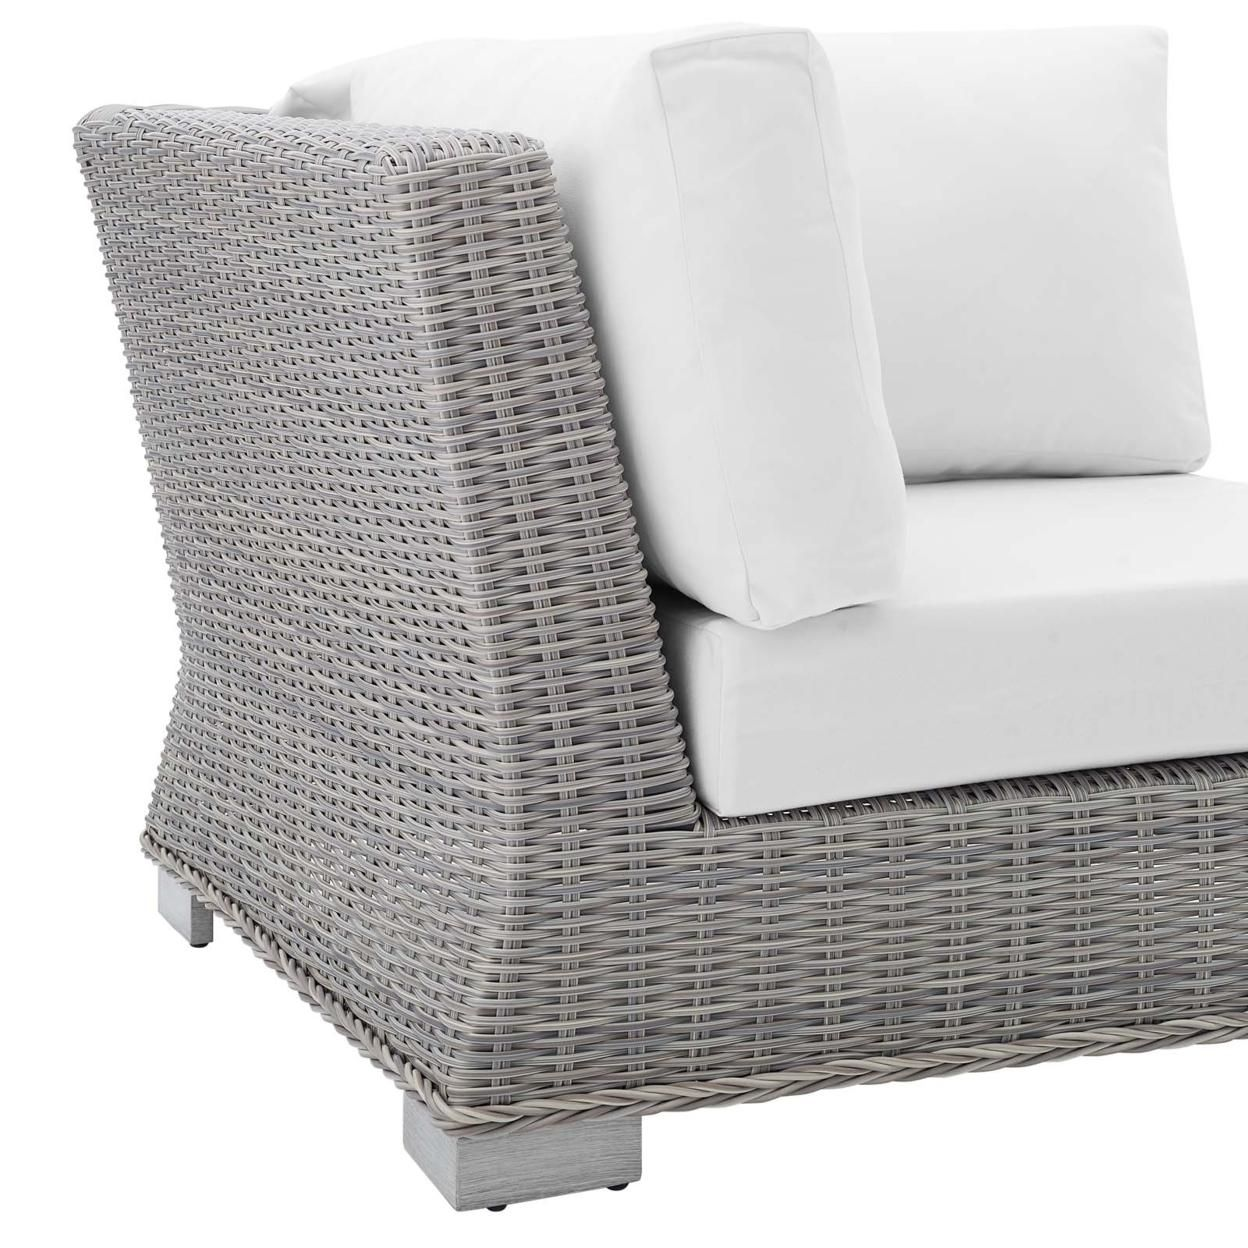 Conway Sunbrella� Outdoor Patio Wicker Rattan Corner Chair, Light Gray White